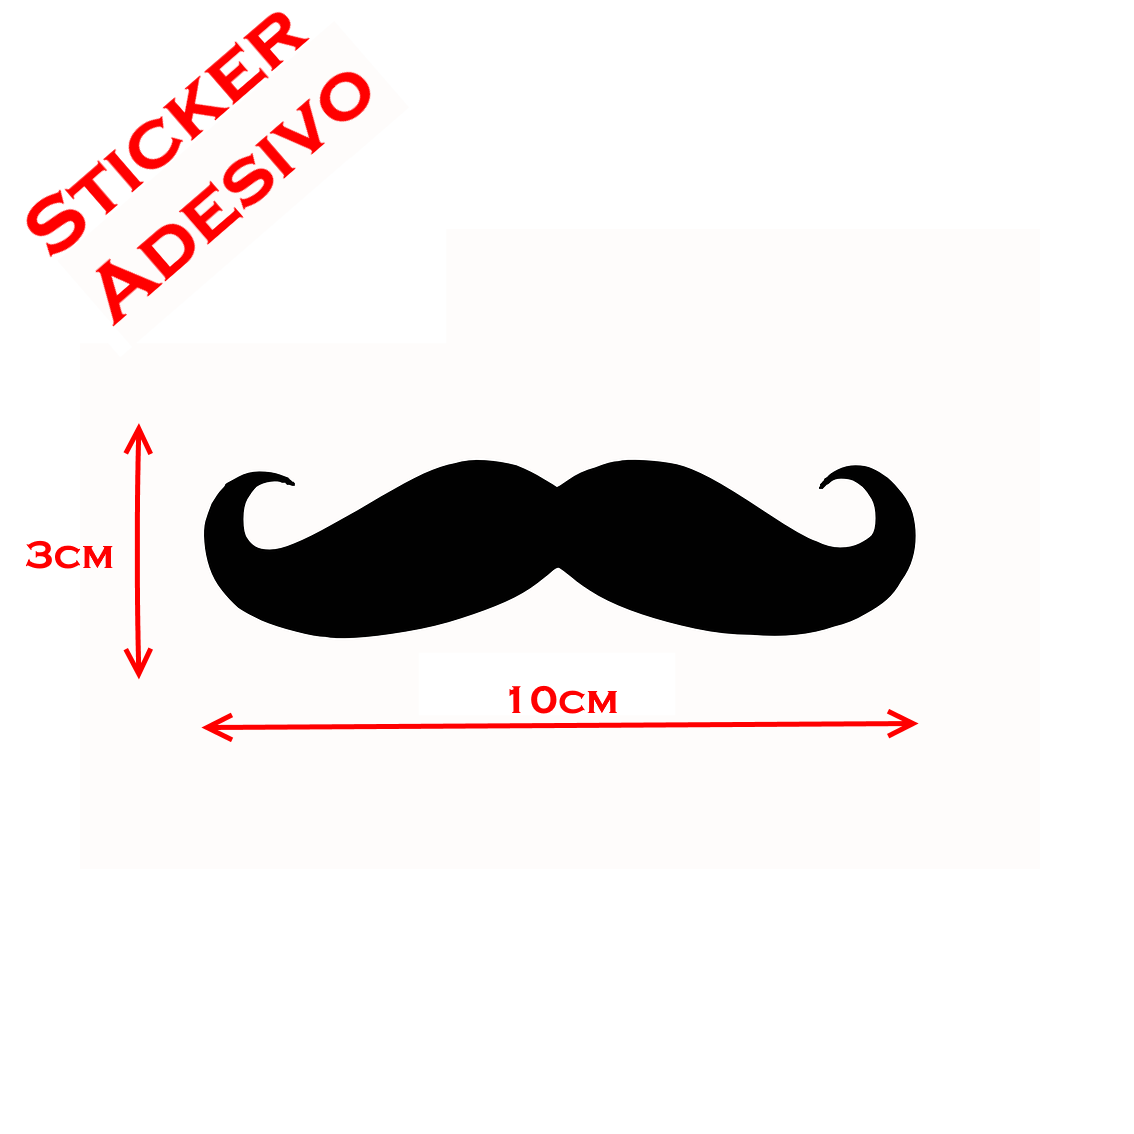 Sticker Adesivo Decal Baffo Baffi Mustache Mania Vintage Tuning Auto Moto Vinil